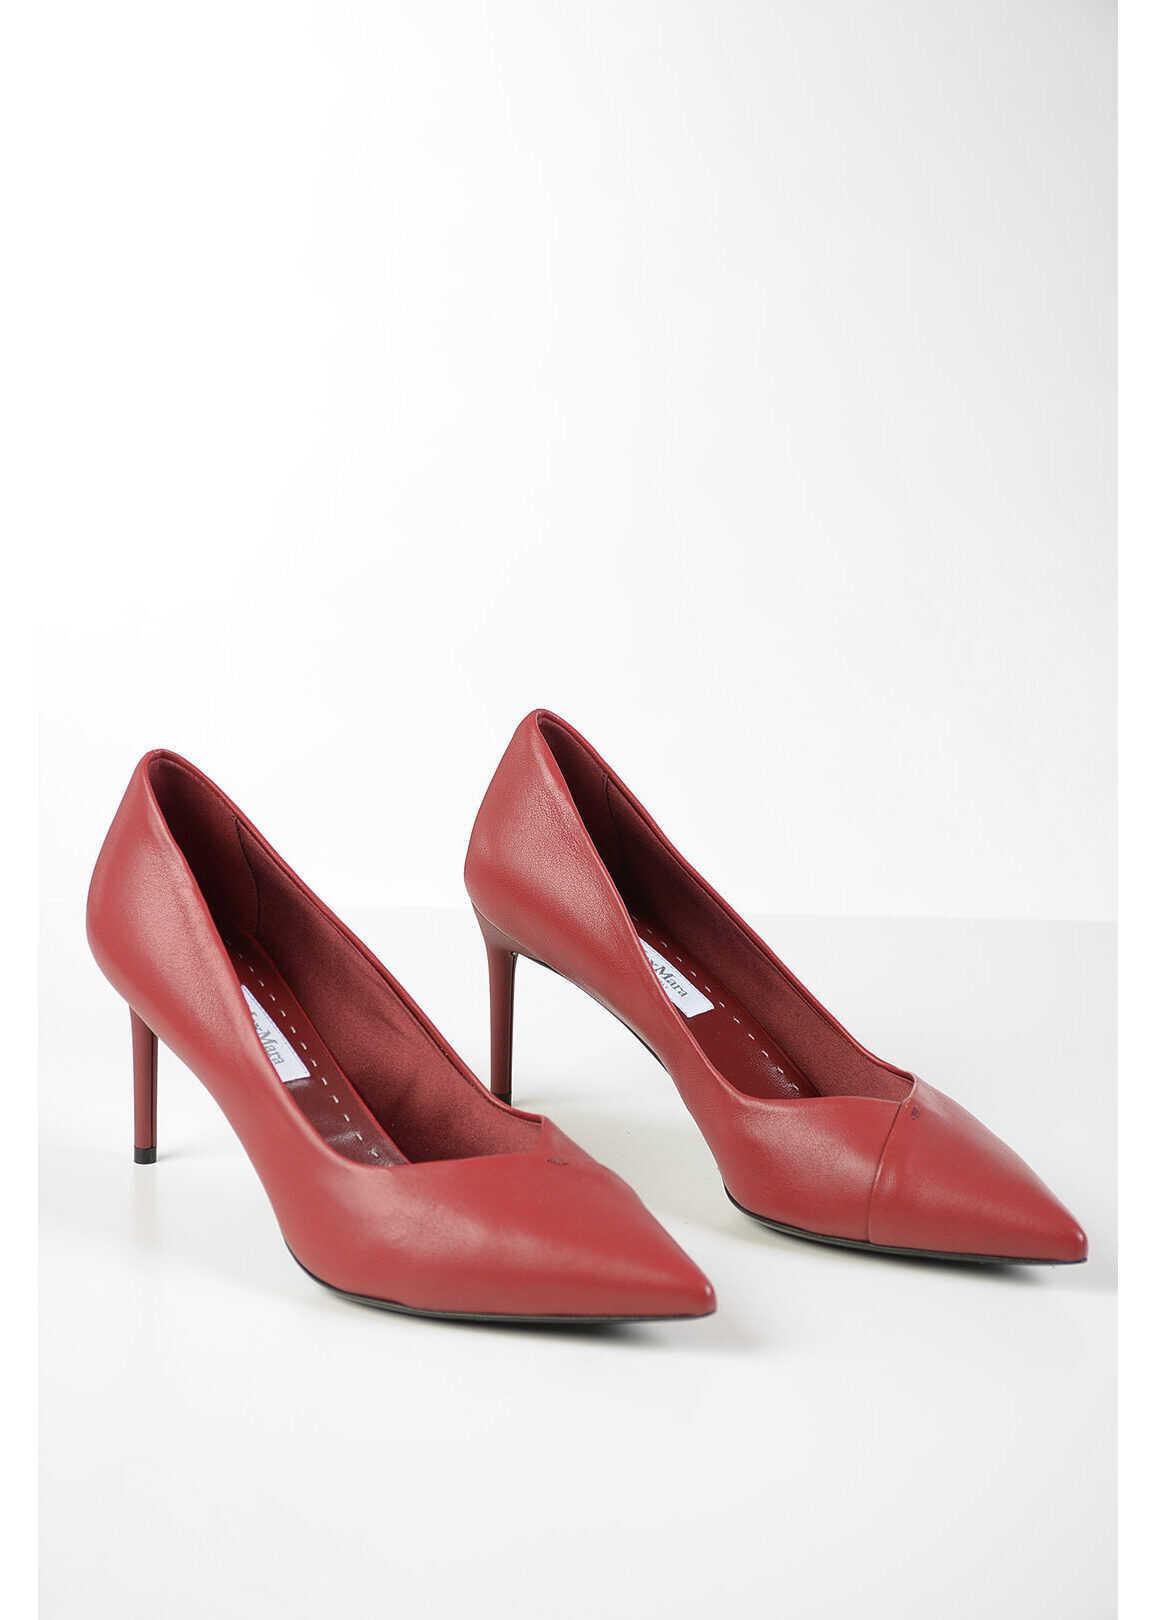 Max Mara Leather SHIRCNY Pumps 8 cm RED